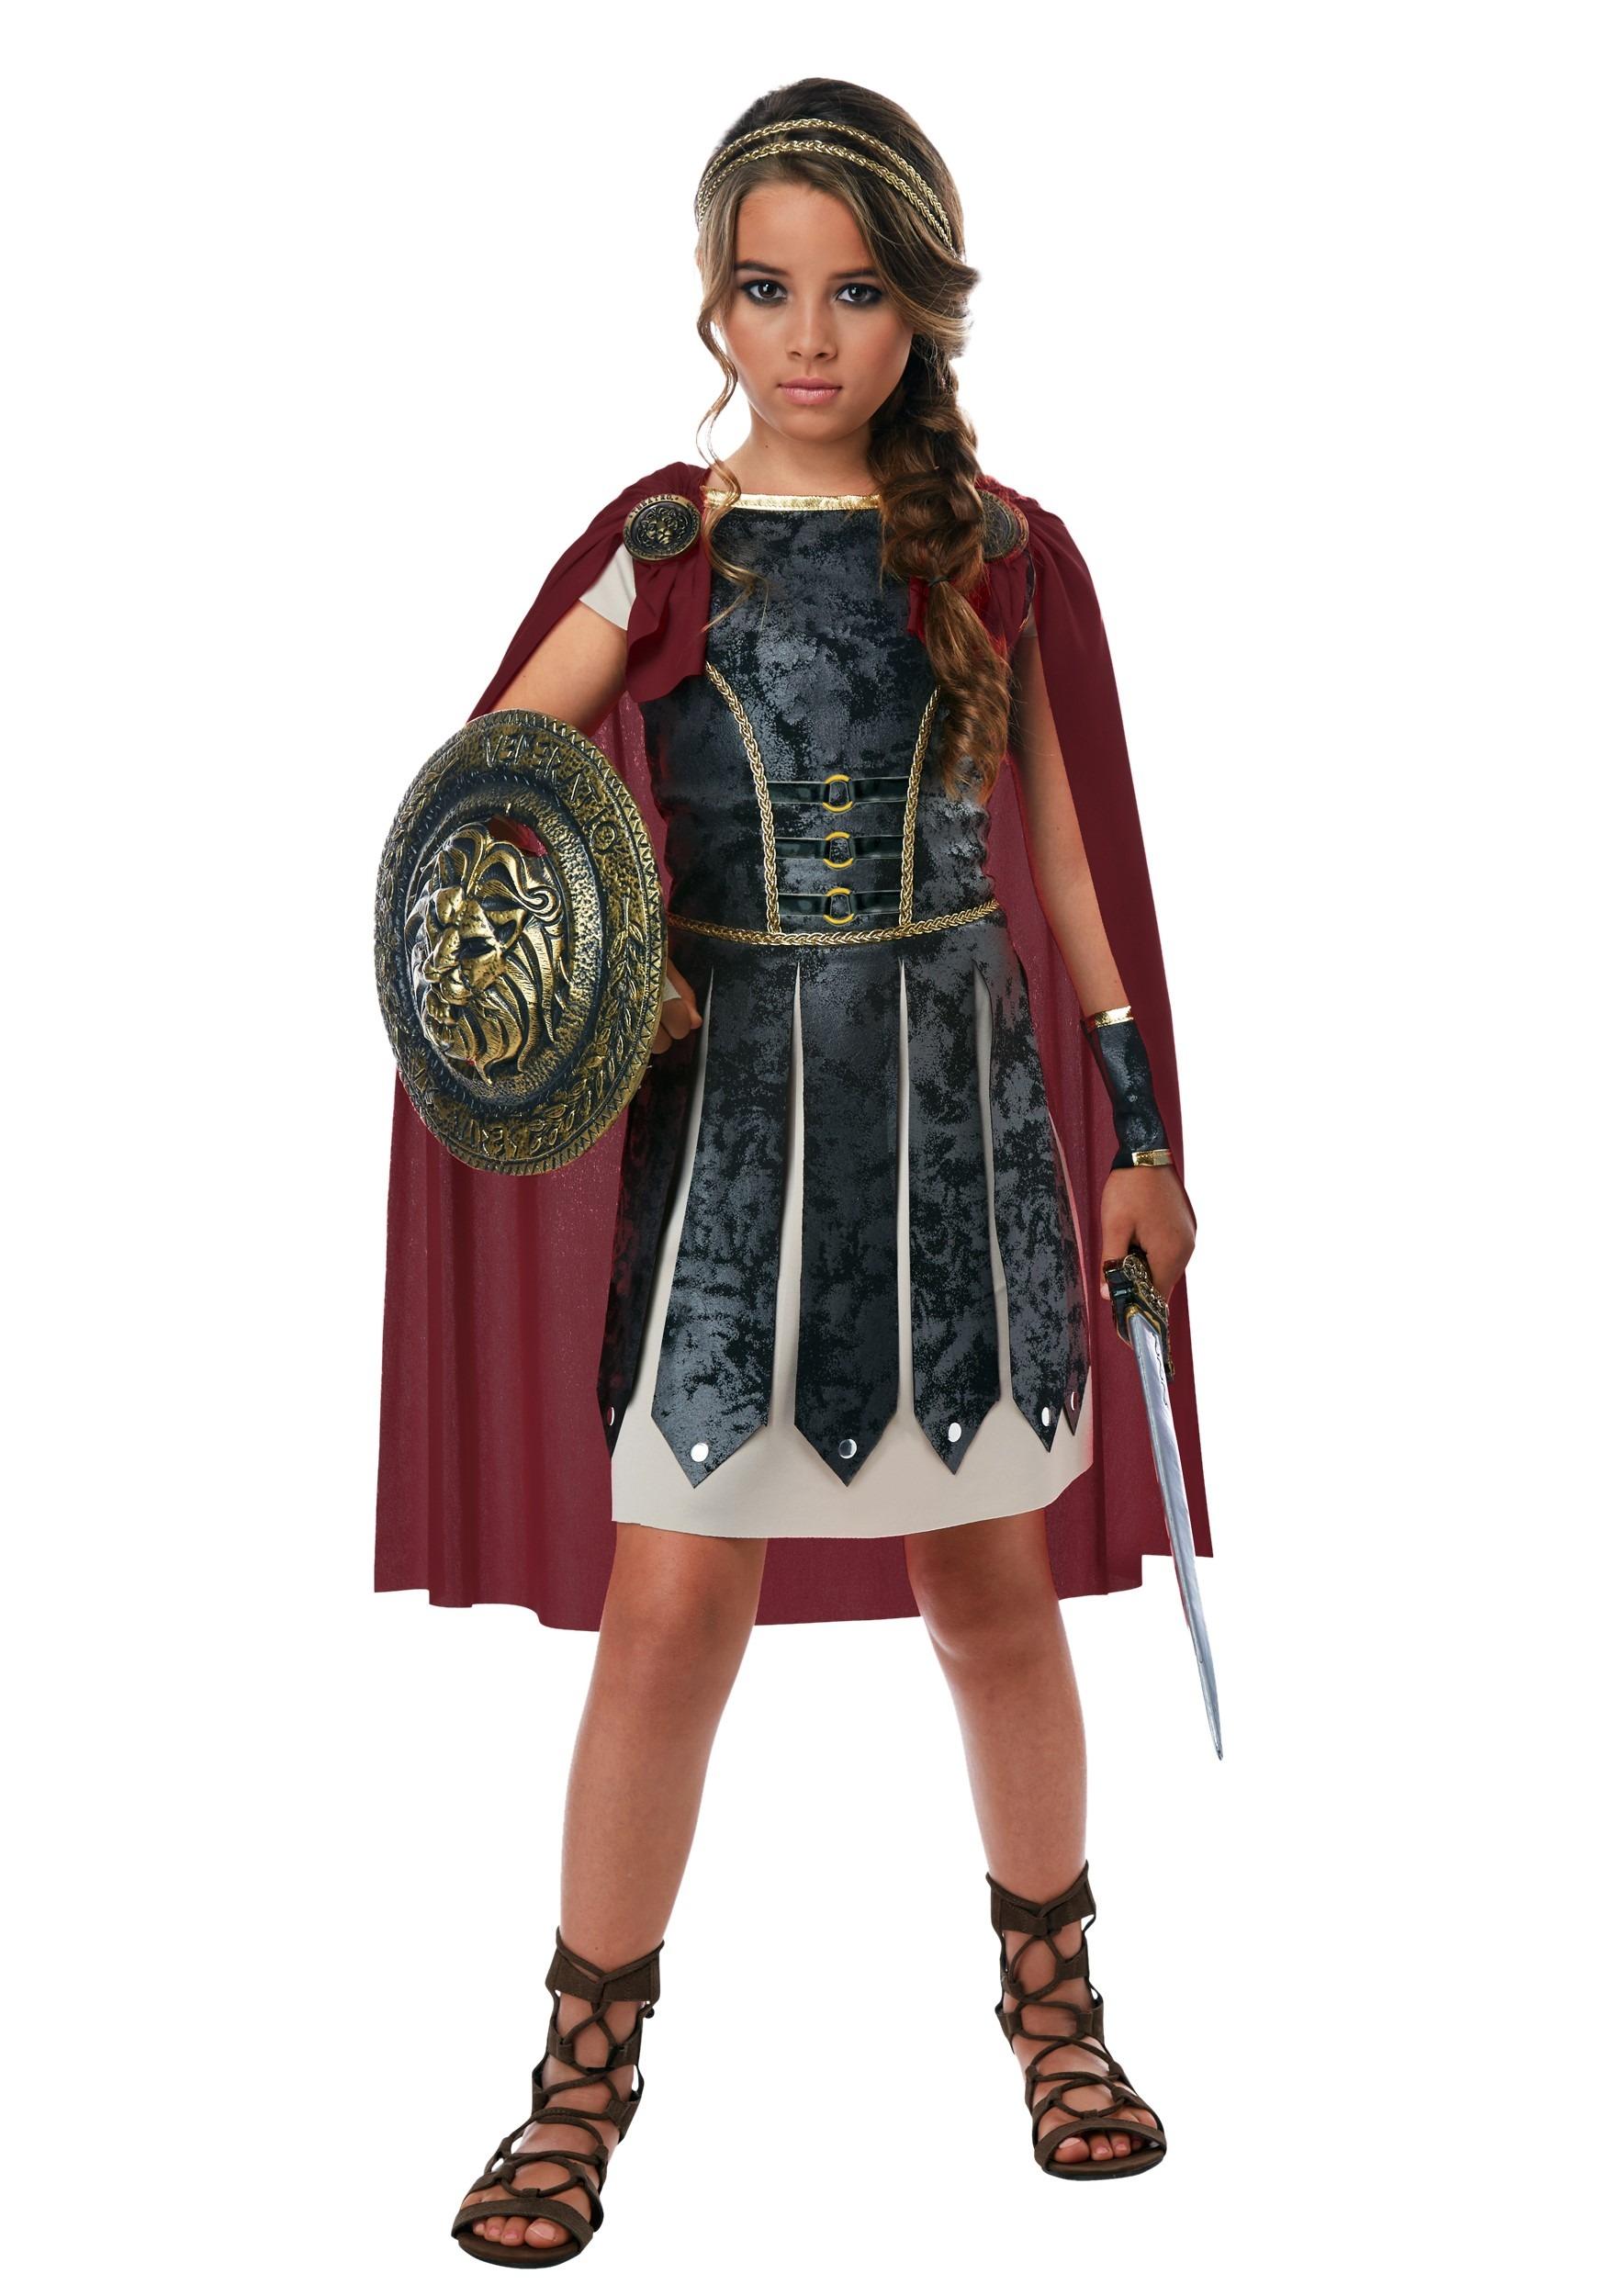 Girls Fearless Gladiator Costume-update1  sc 1 st  Fun.com & Fearless Gladiator Girls Costume